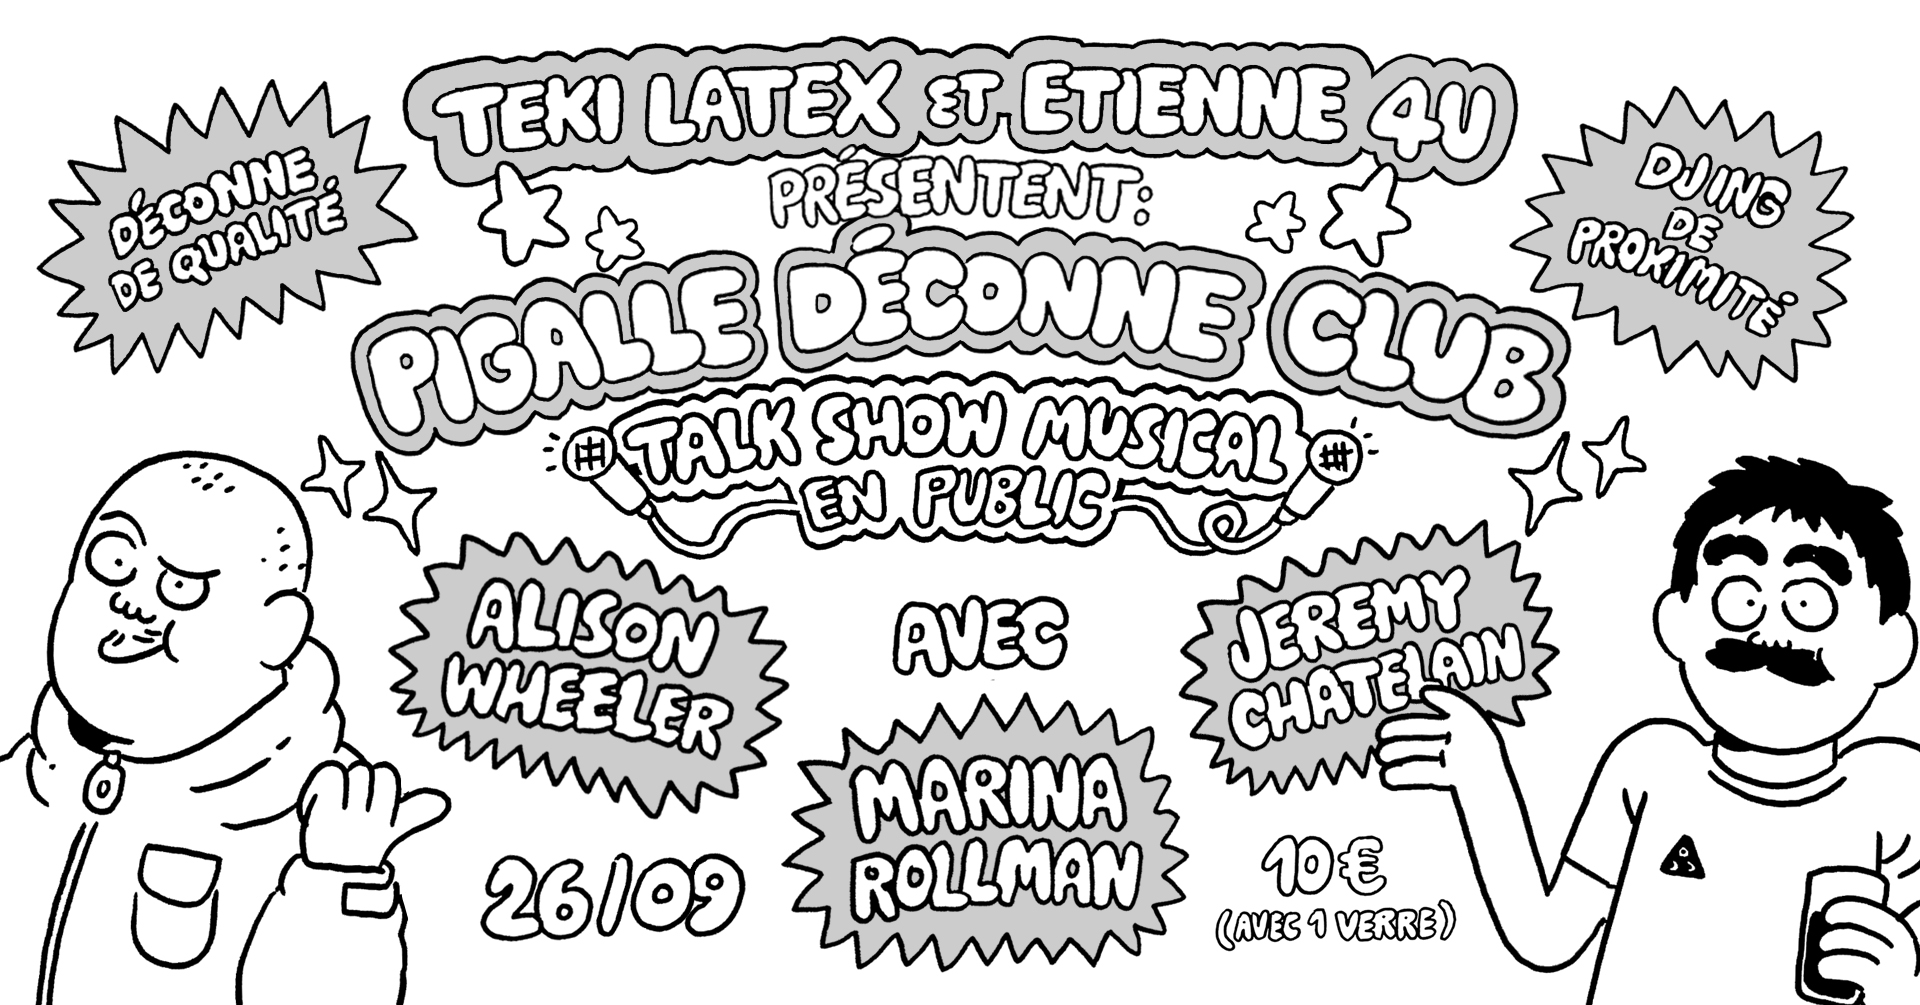 Pigalle Déconne Club : Teki Latex & Etienne 4U